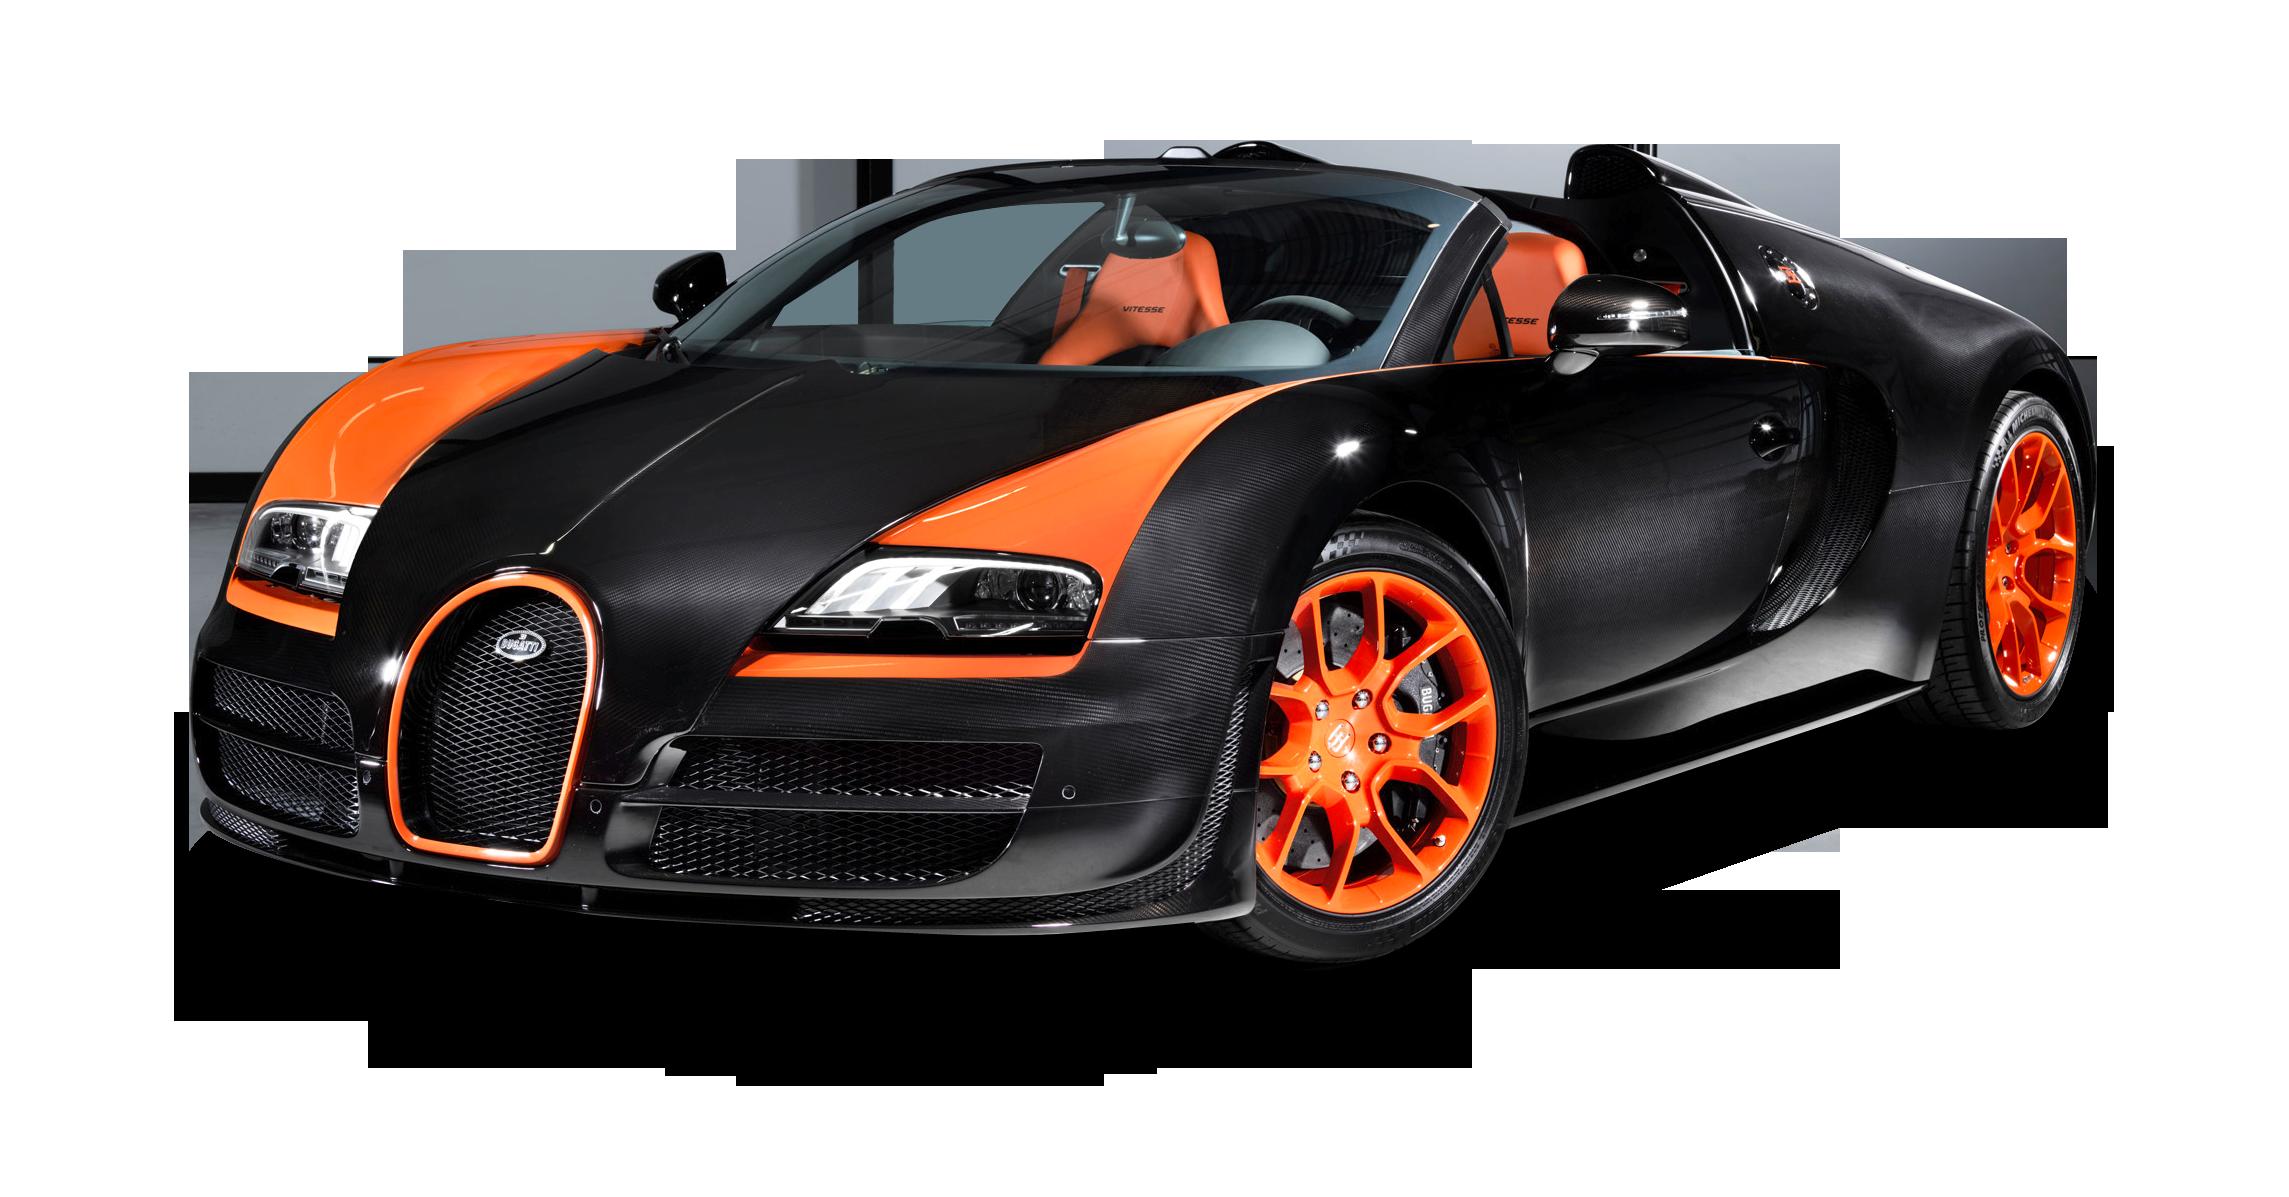 bugatti chiron rc car html with Bugatti Veyron   3144 on Lamborghini Veneno Bugatti Veyron as well Bugatti Veyron also Toy Bugatti furthermore 32788318900 also Bugatti Chiron Is Official 1500.